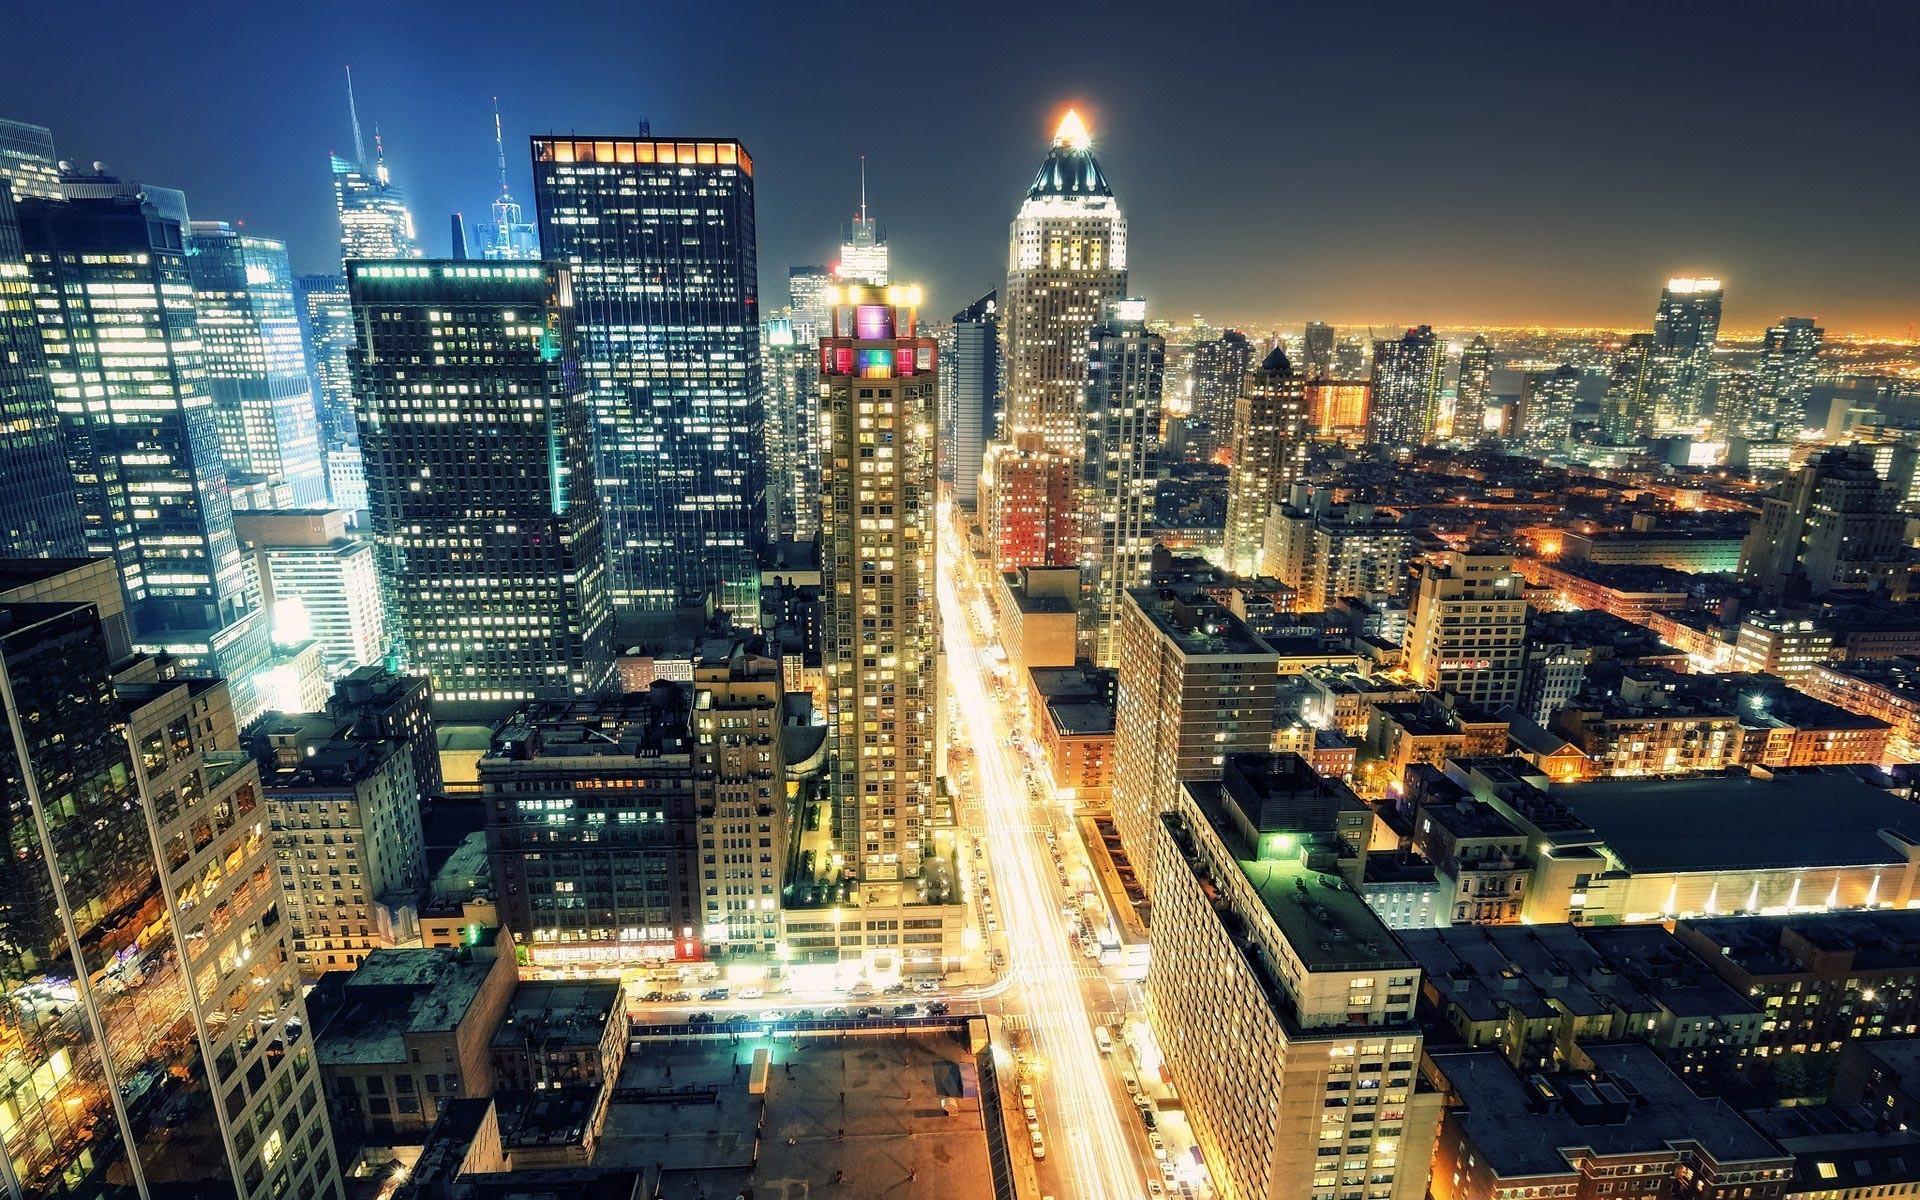 1920x1200 City Skyline Night Drawing Full Hd Wallpapers Wallpaper 1920x1200px